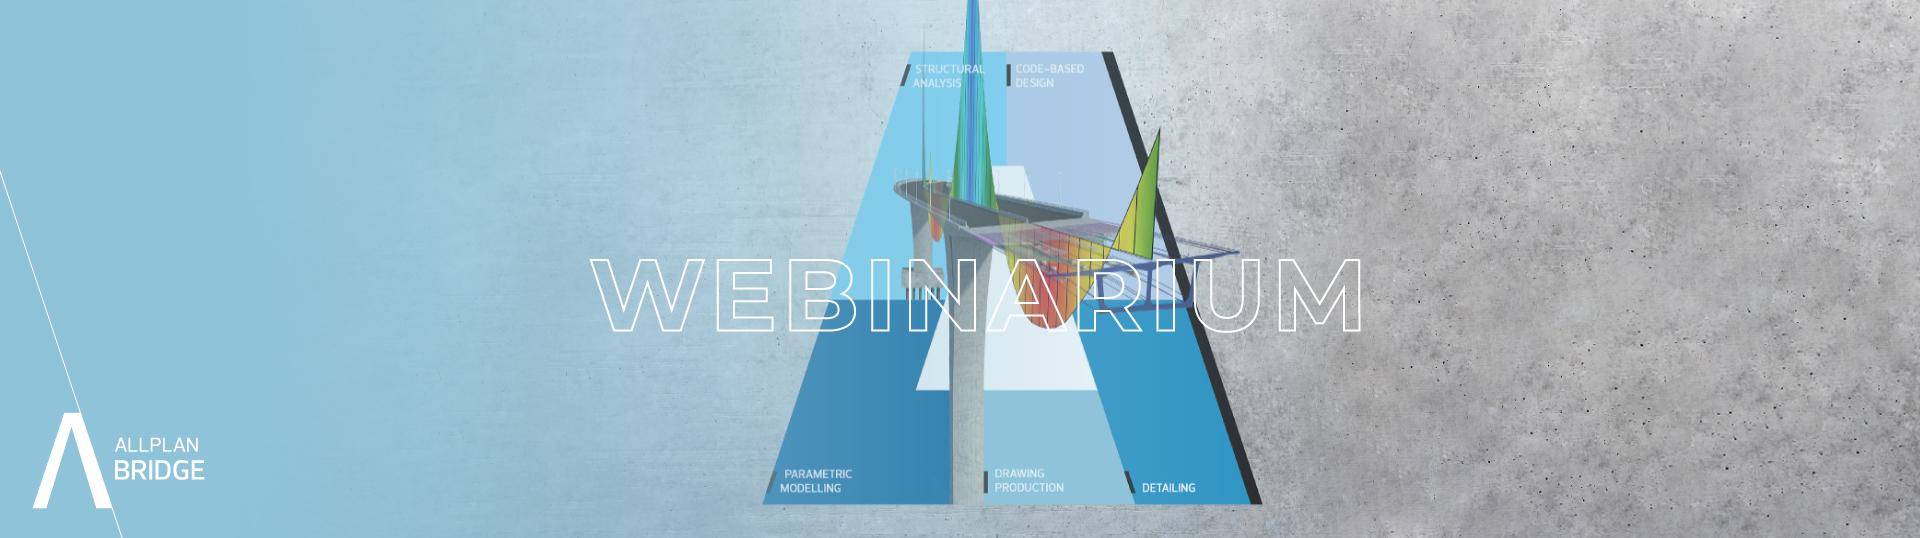 "Webinarium ""Allplan Bridge"""